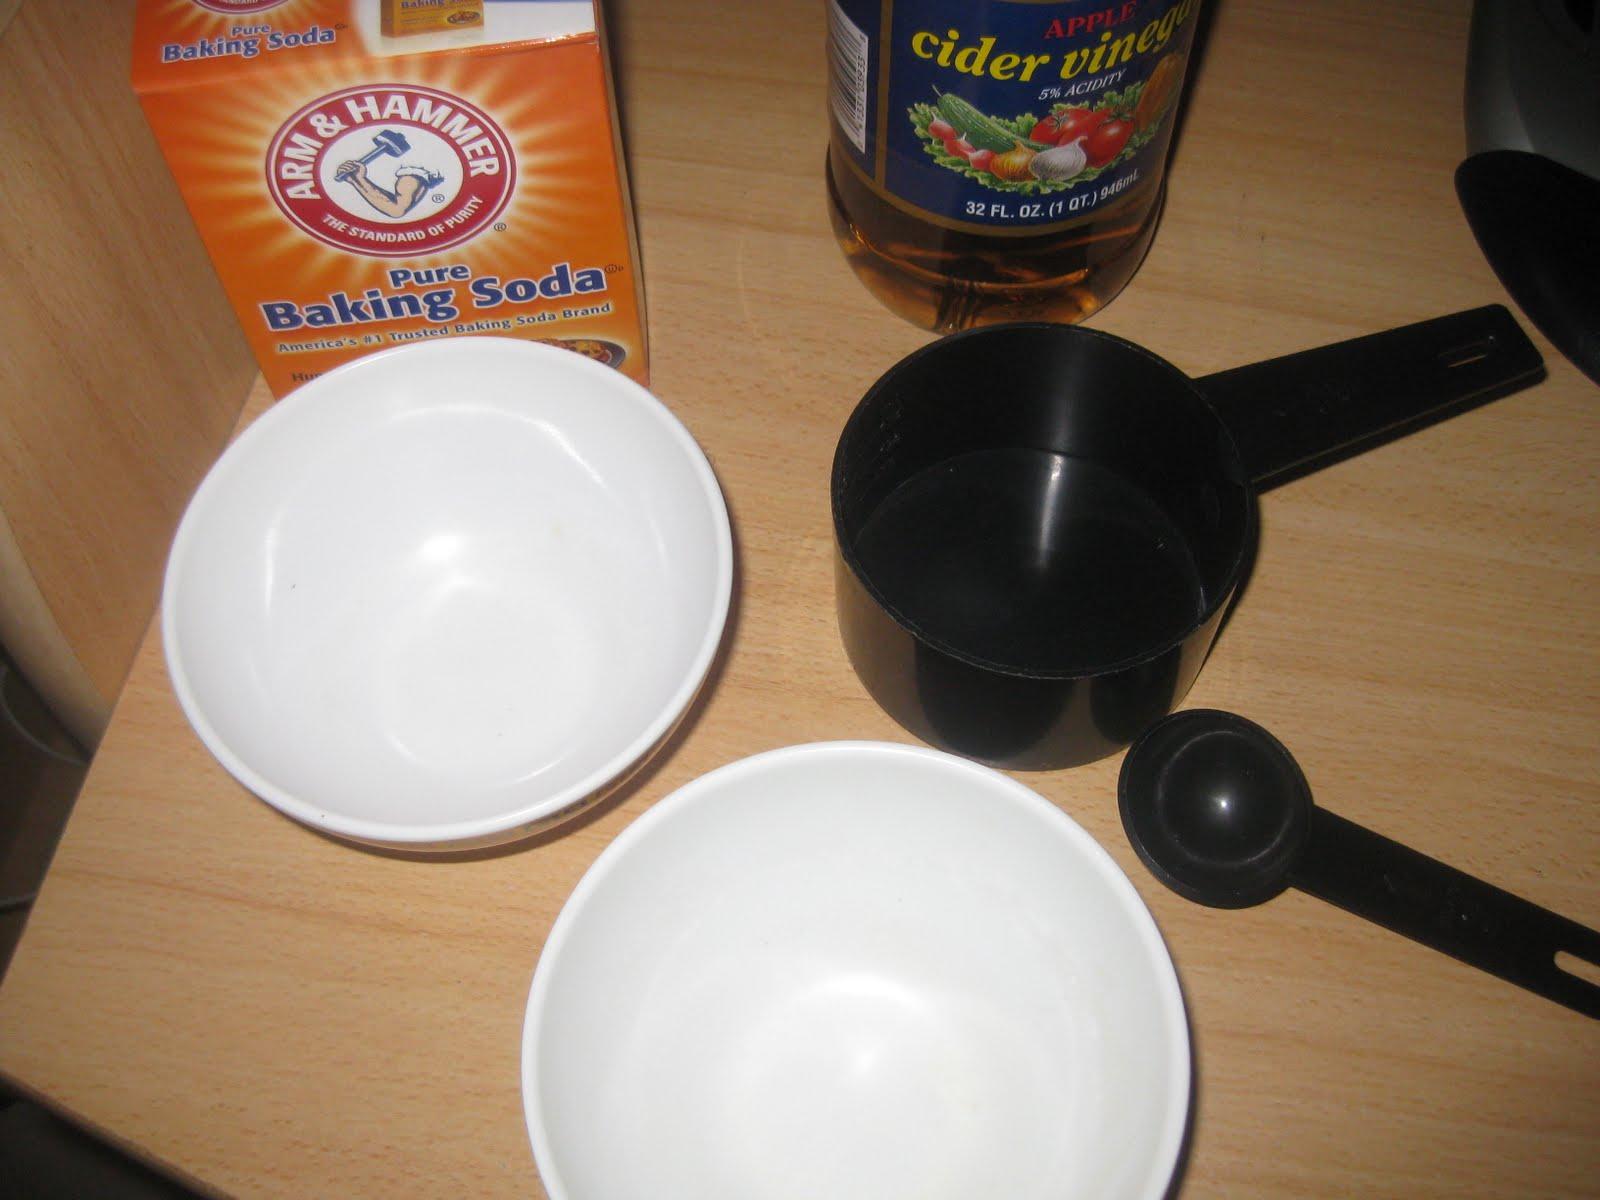 Kreyola's Journeys: How to: Baking Soda Wash & Apple Cider